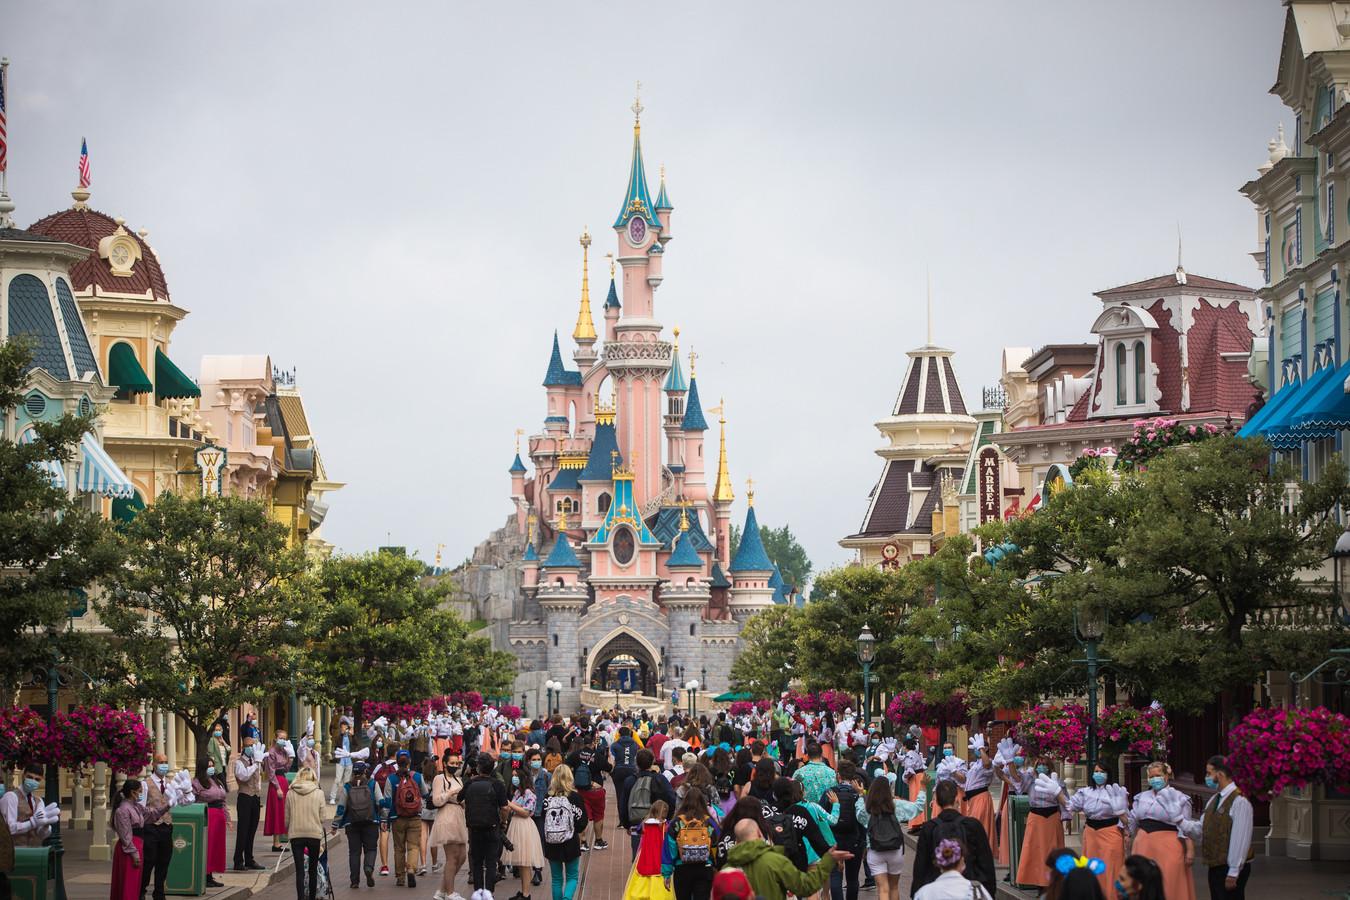 Sfeerbeeld van Disneyland Paris.